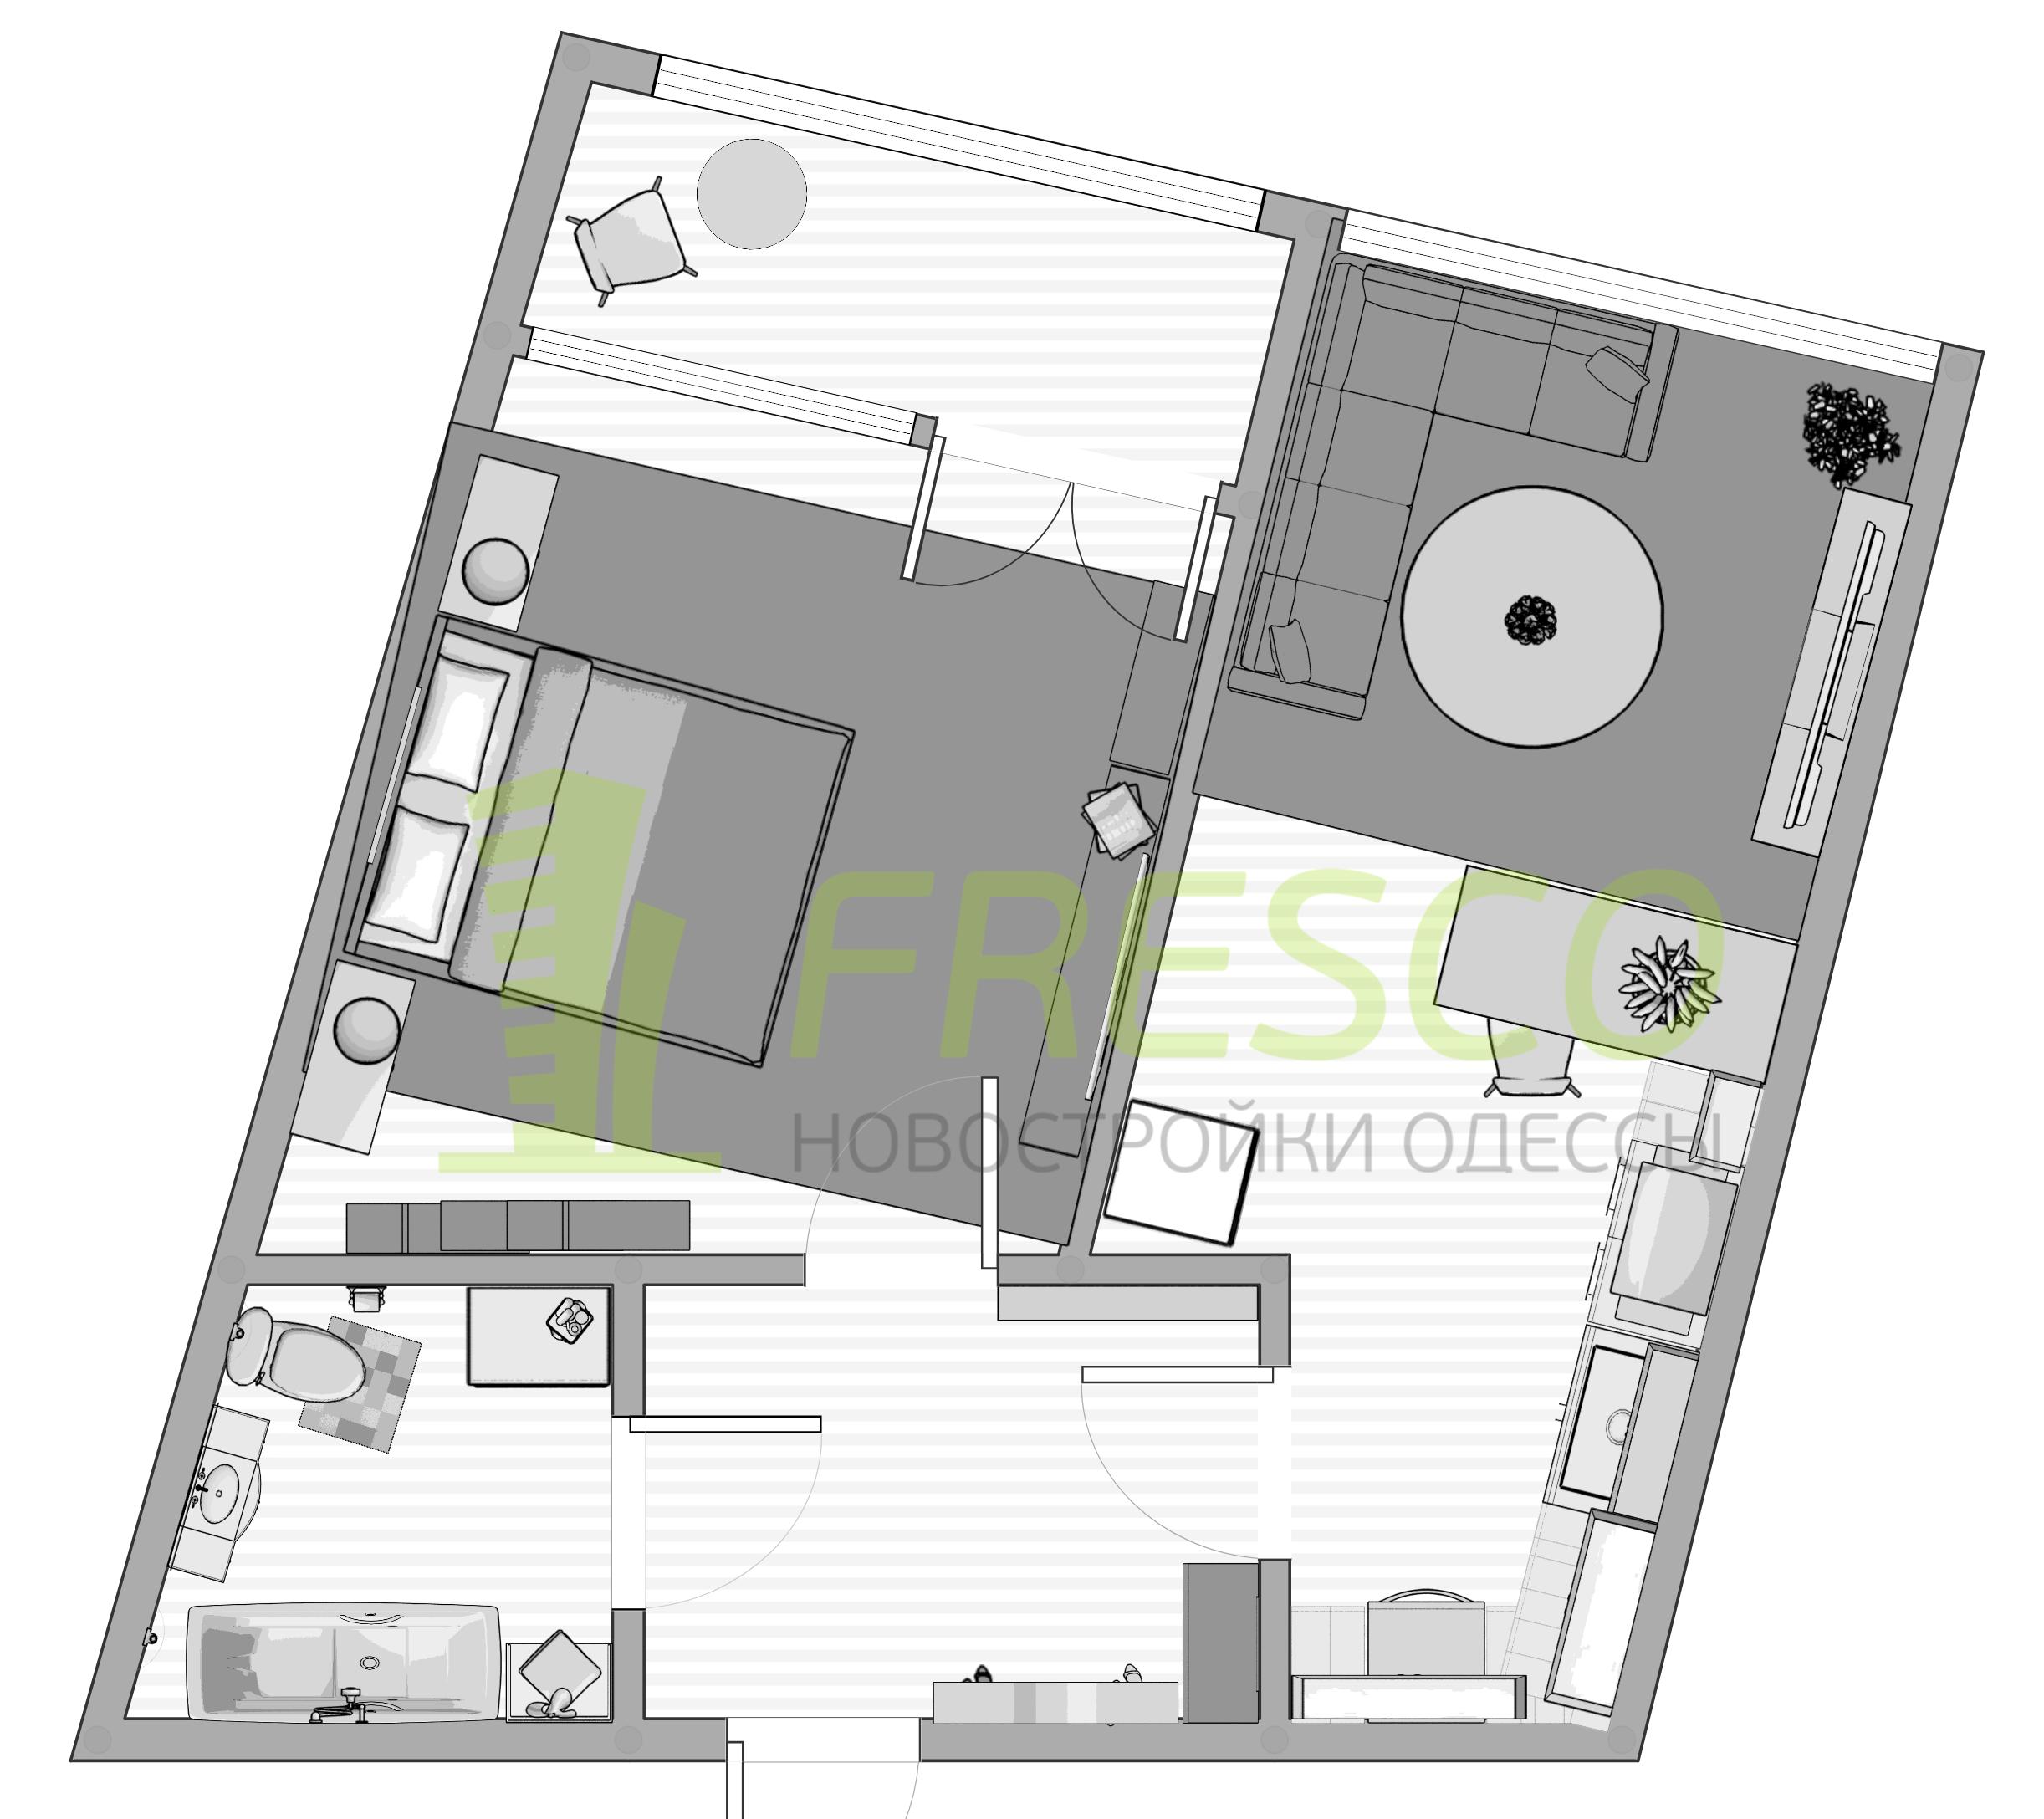 Однокомнатная - ЖК Kandinsky Residence (Кандинский)ПроданаПлощадь:47,77m²